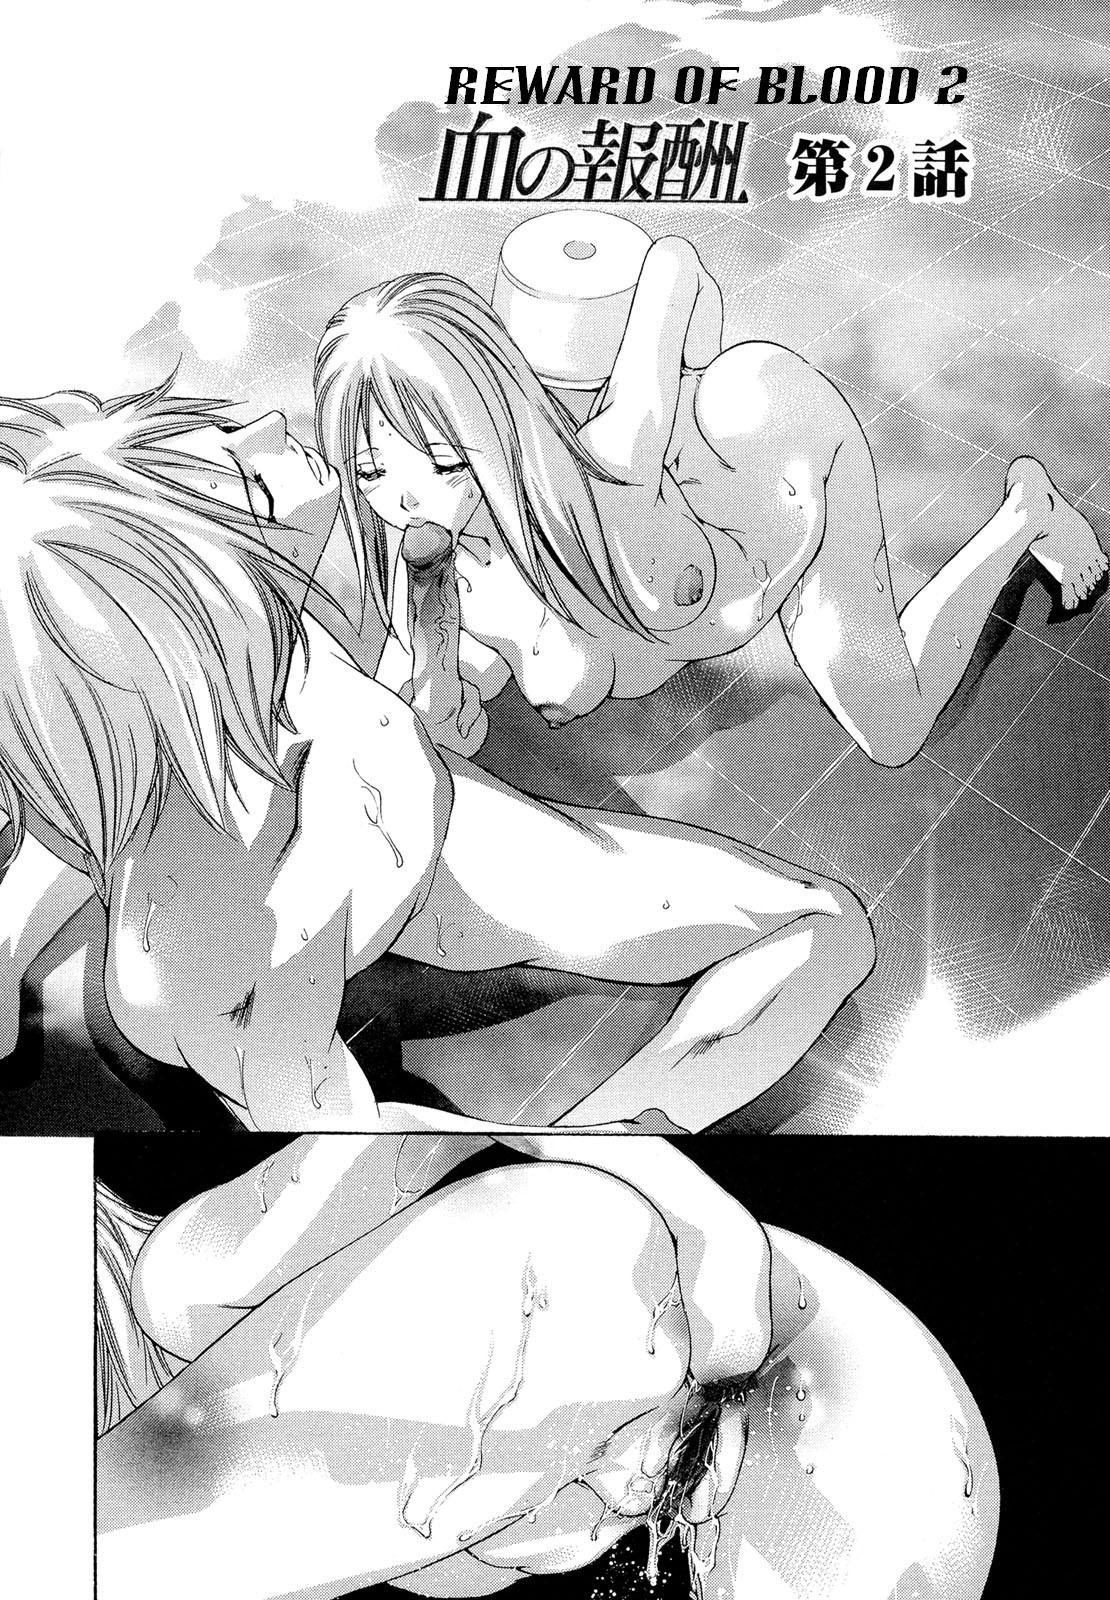 Jubaku no Stage - Reward of Blood 33